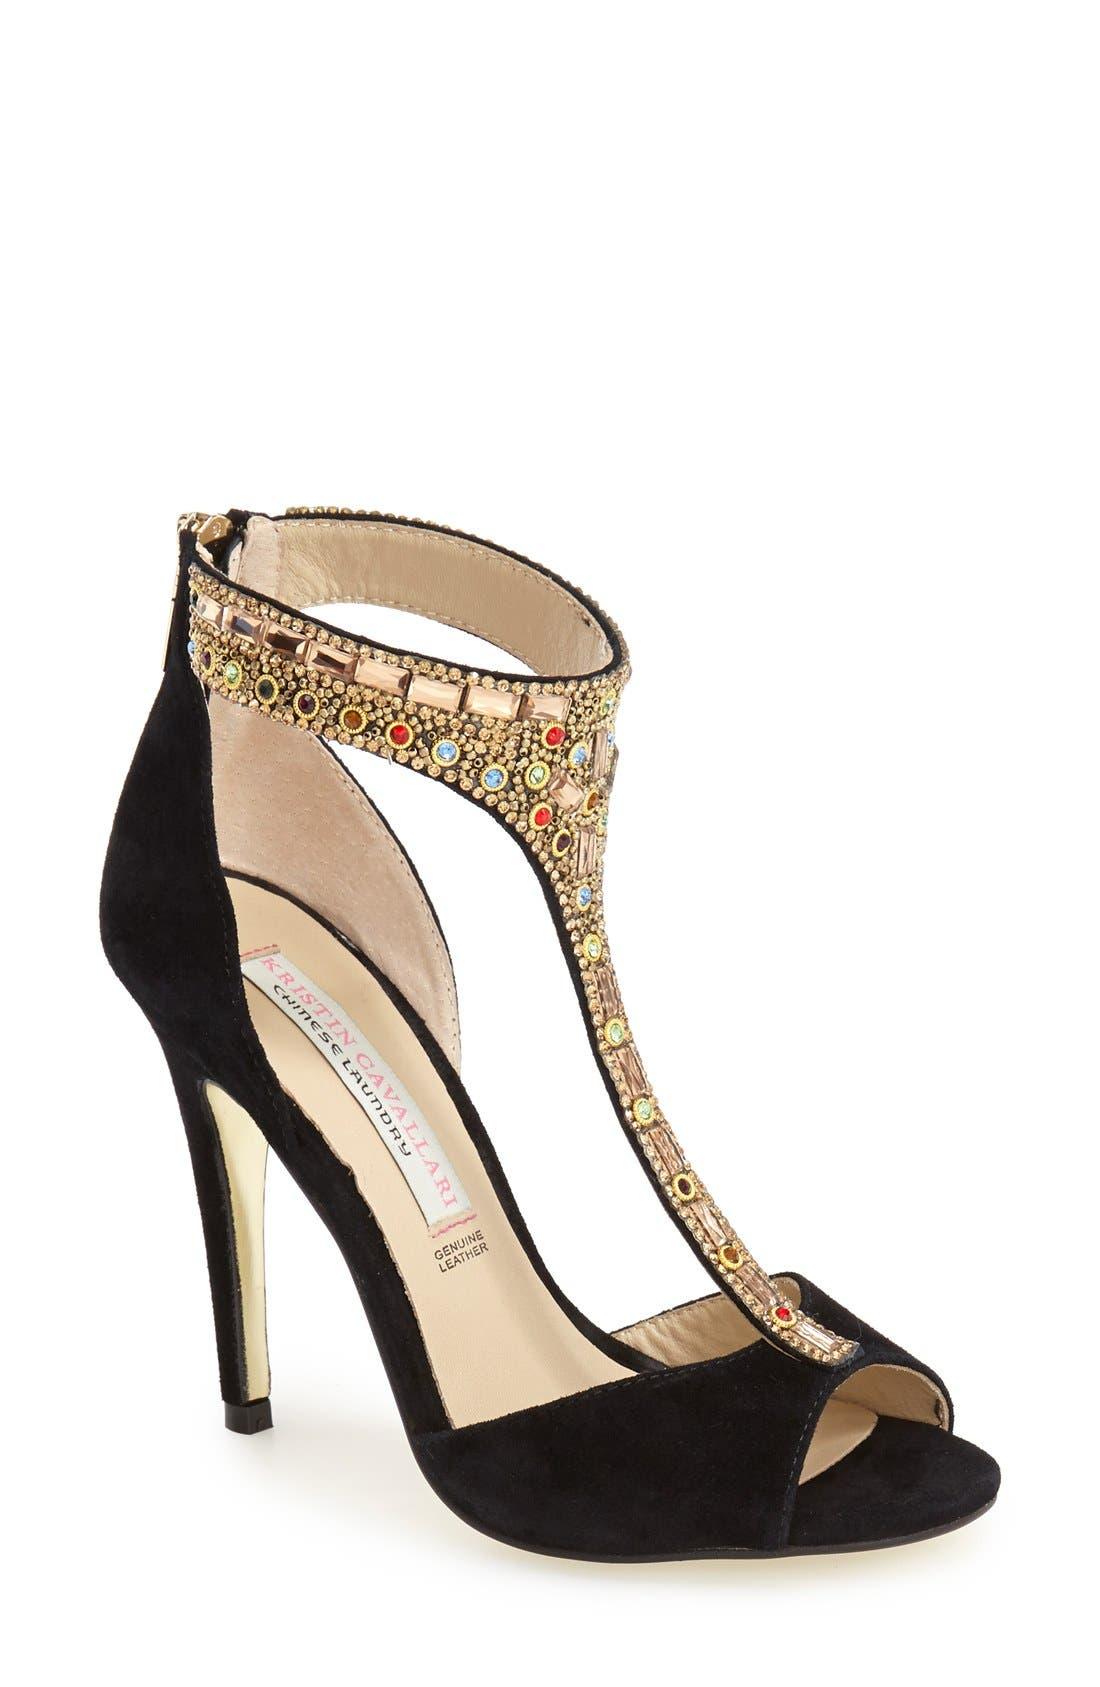 KRISTIN CAVALLARI 'Lena' Crystal T-Strap Sandal